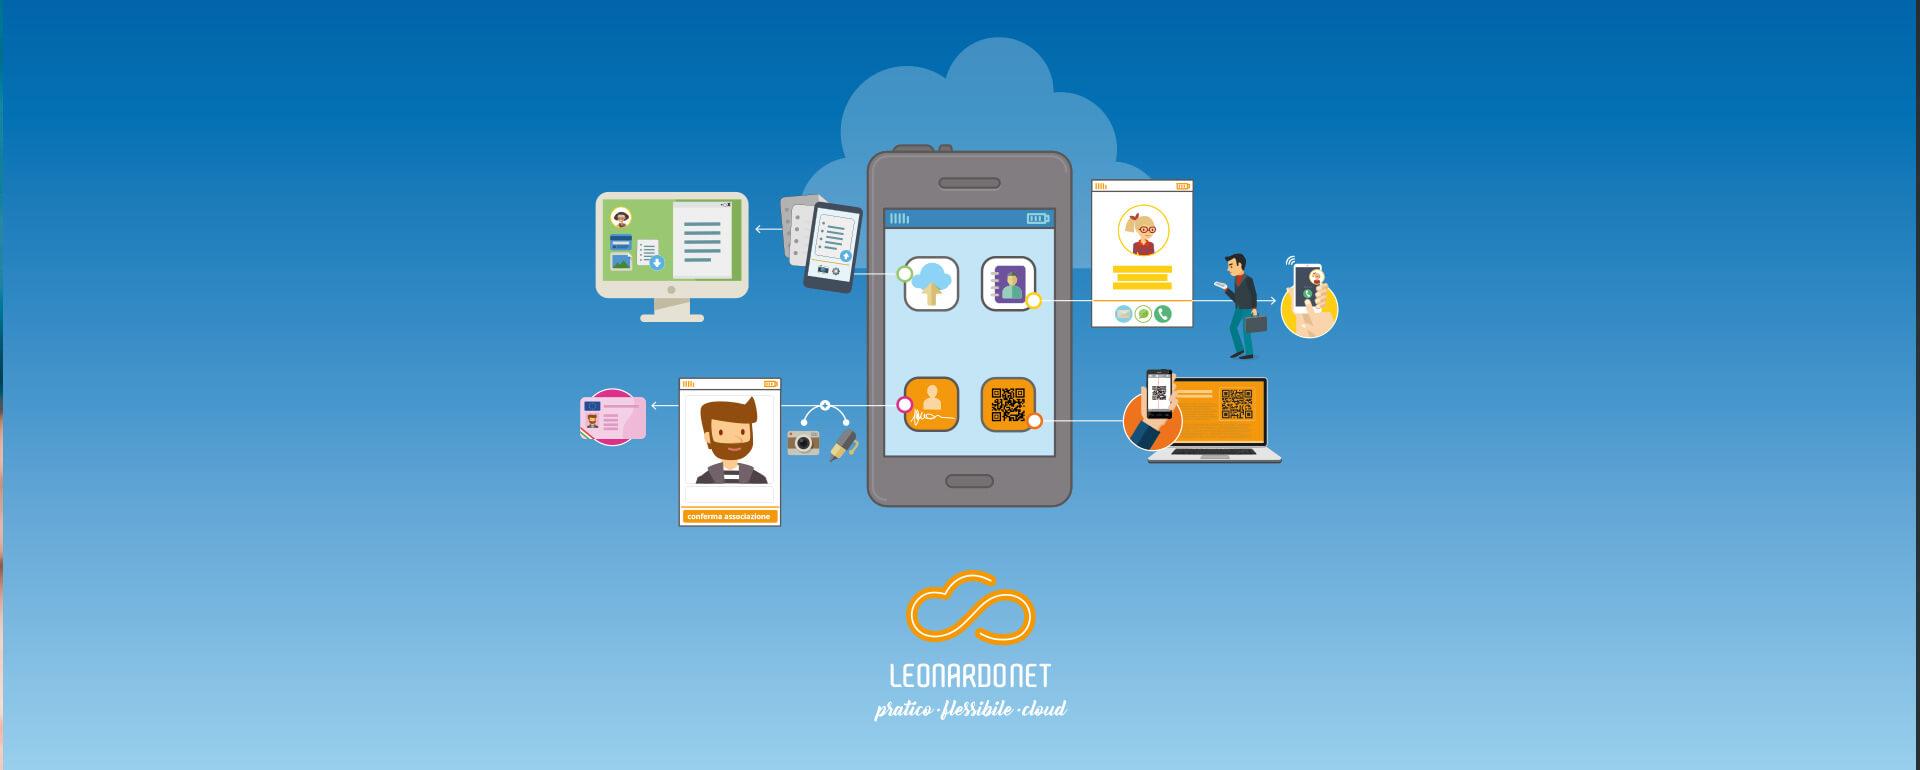 L'App Leonardo Net